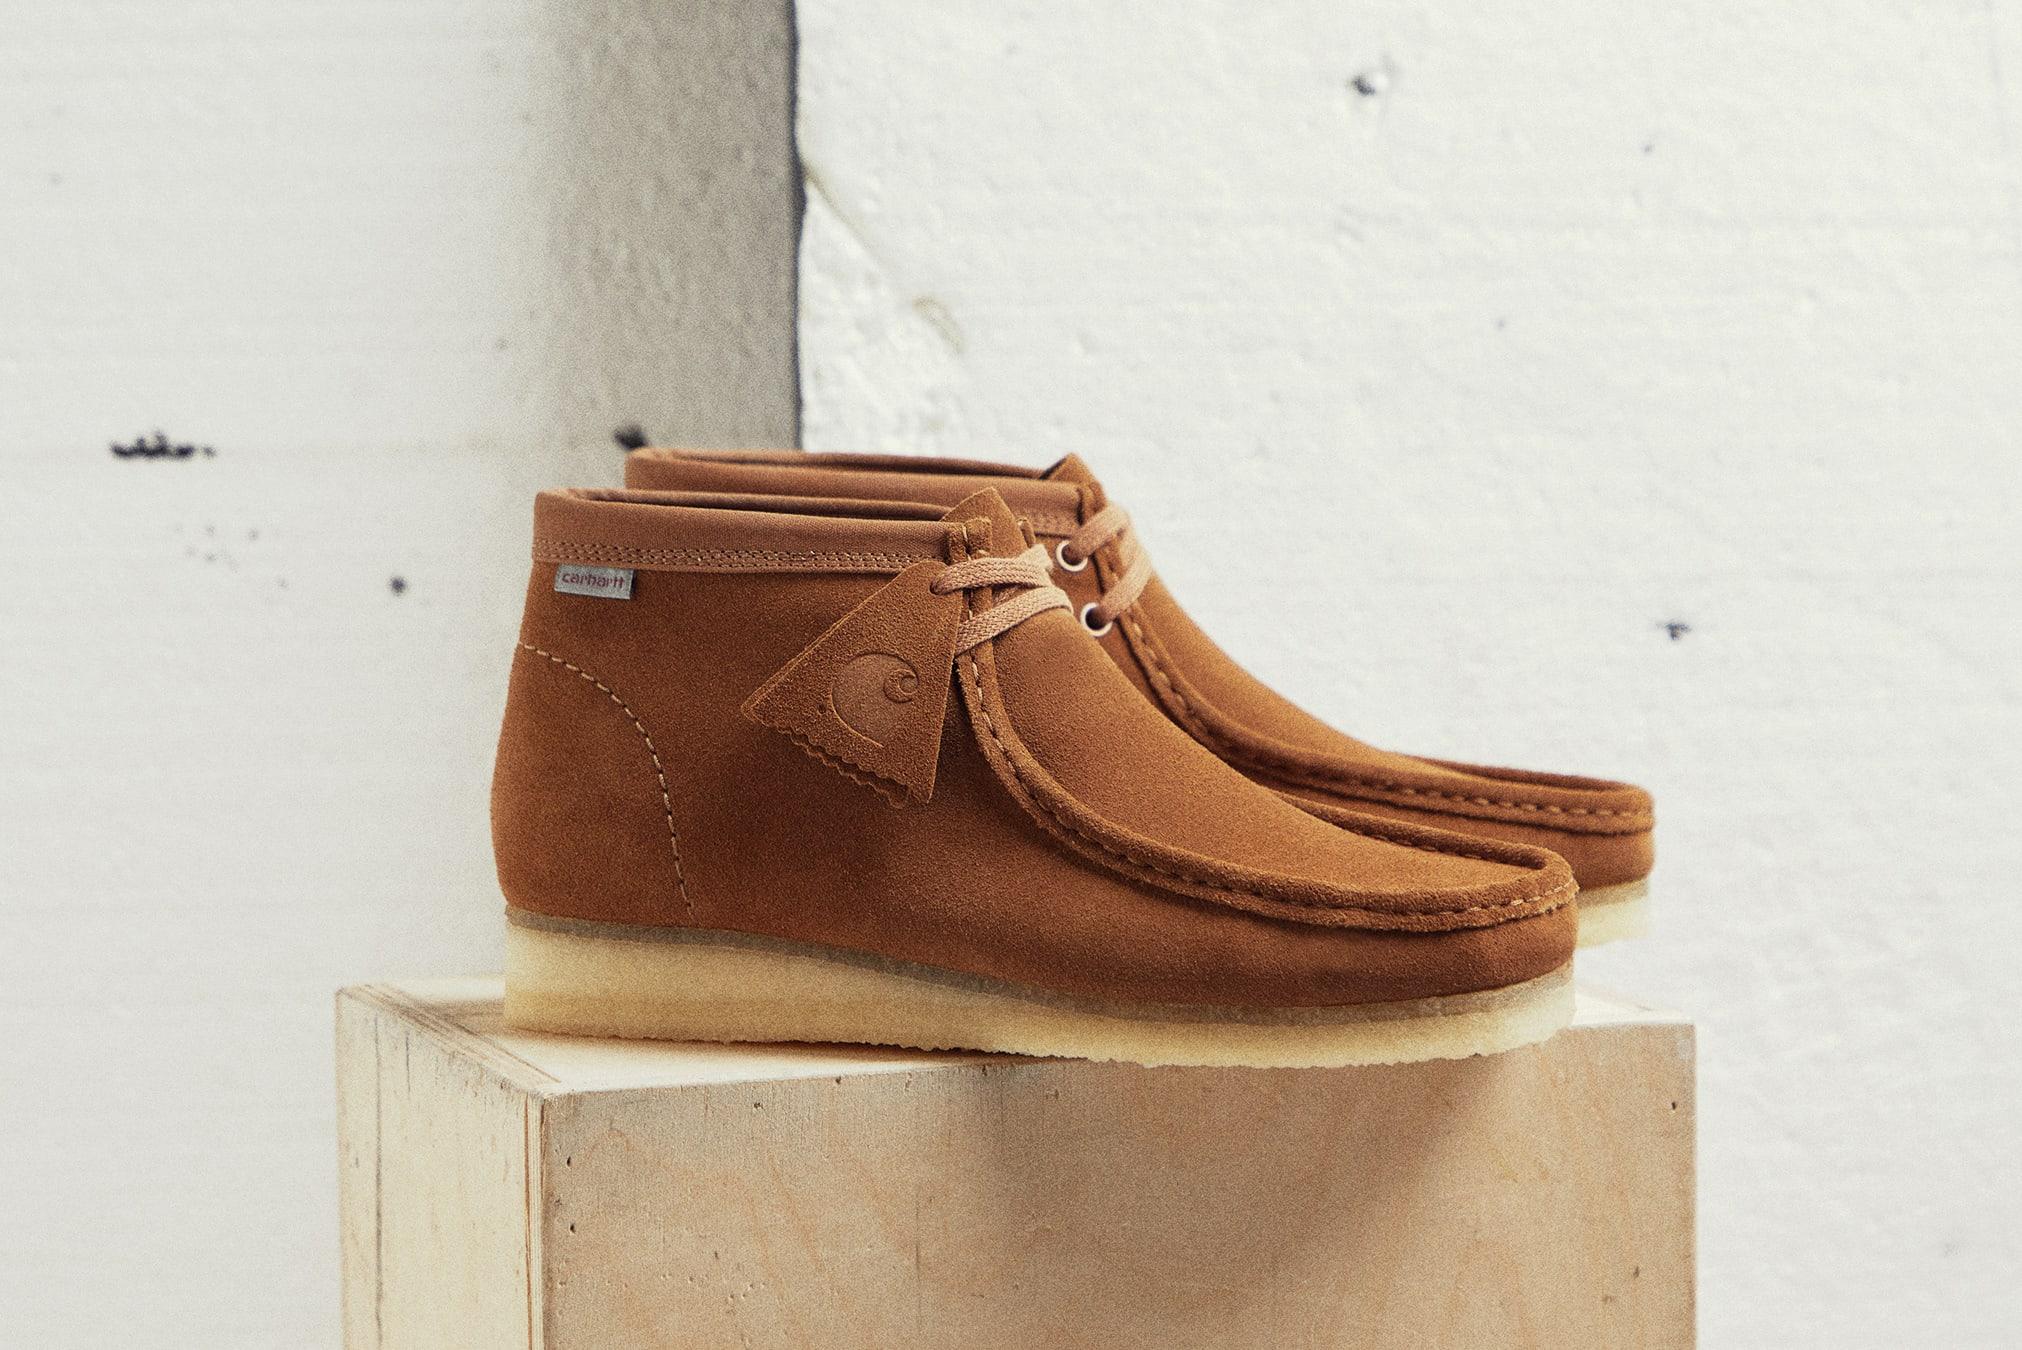 Clarks Originals x Carhartt Wallabee Boot - 26146193